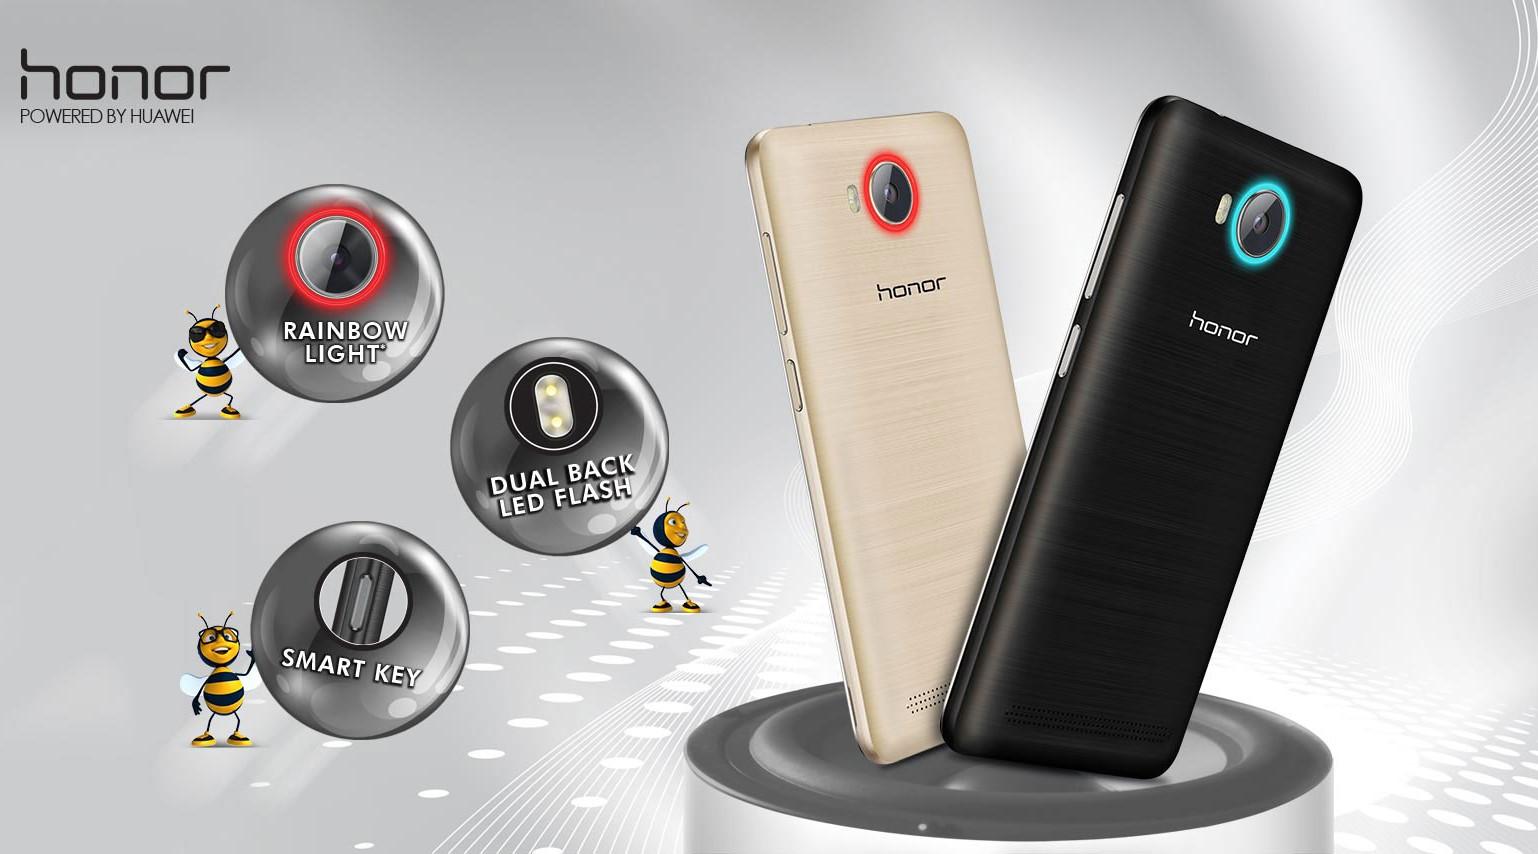 HUAWEI、インド市場向けに背面レインボーライトが特徴の「Honor Bee2」を発売